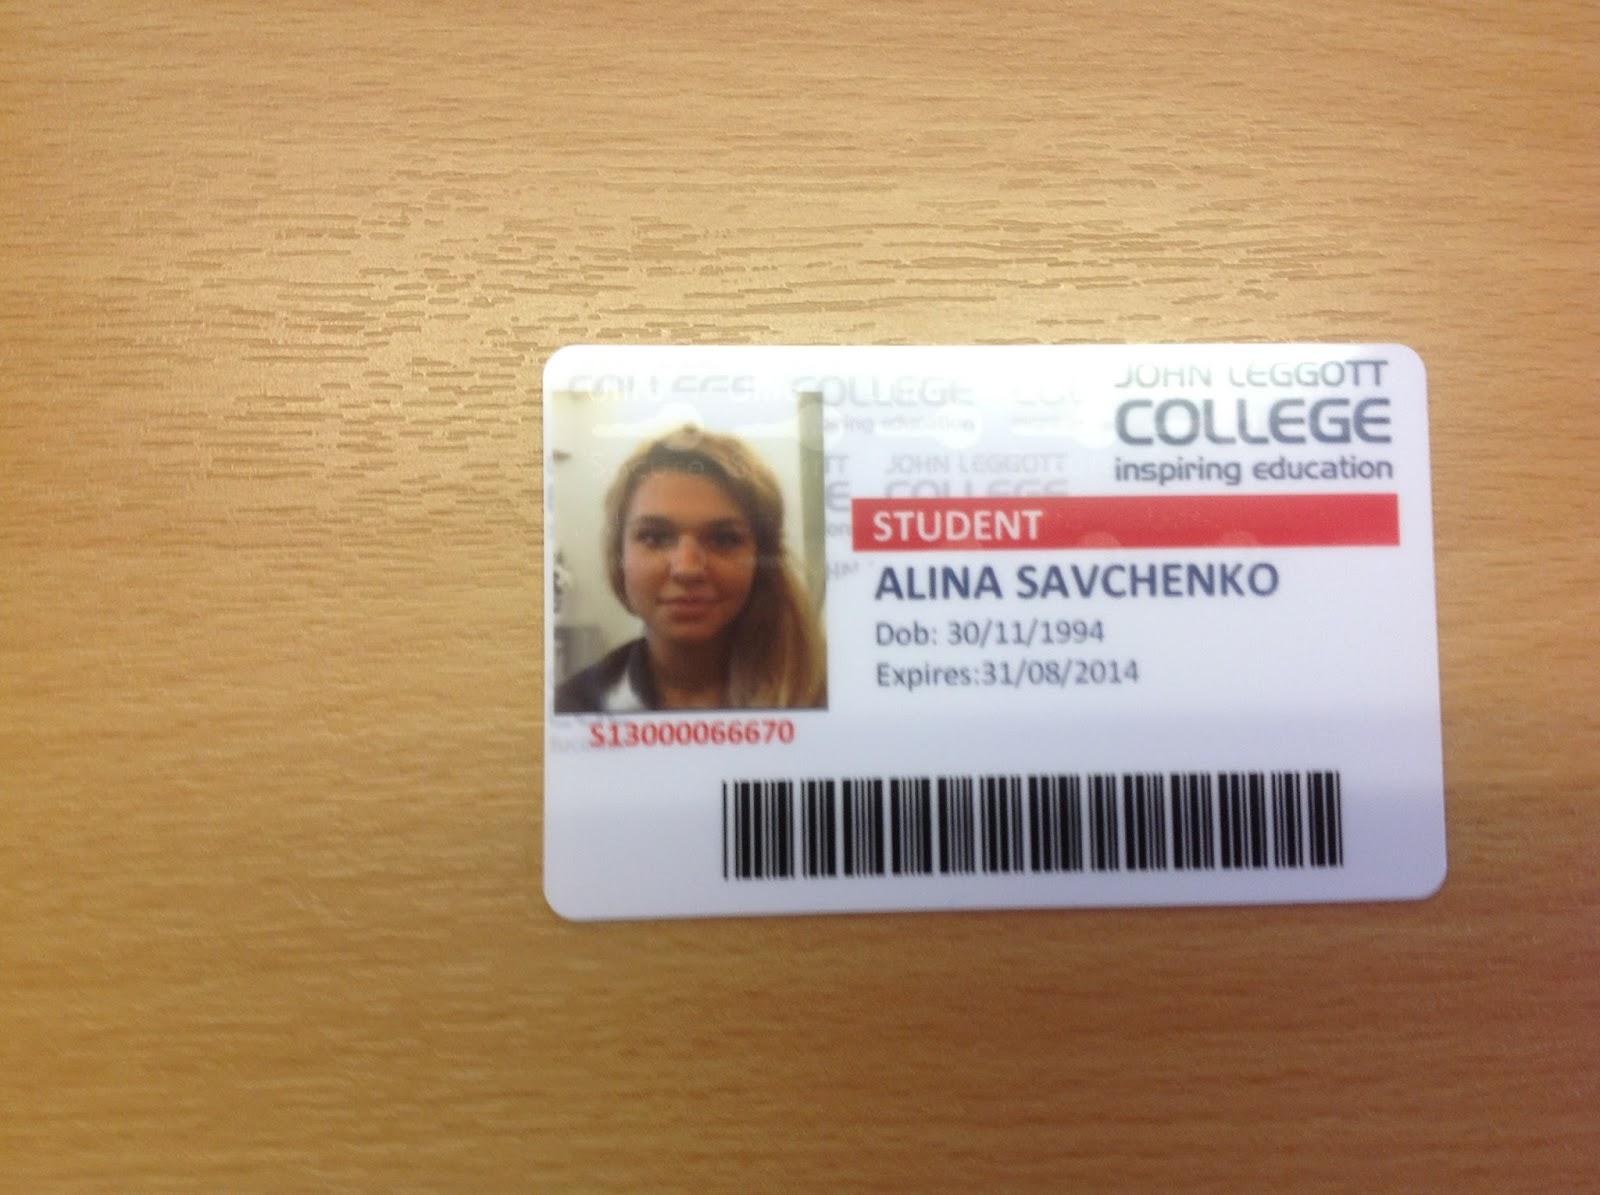 Jlc a level taster course student id card maxwellsz